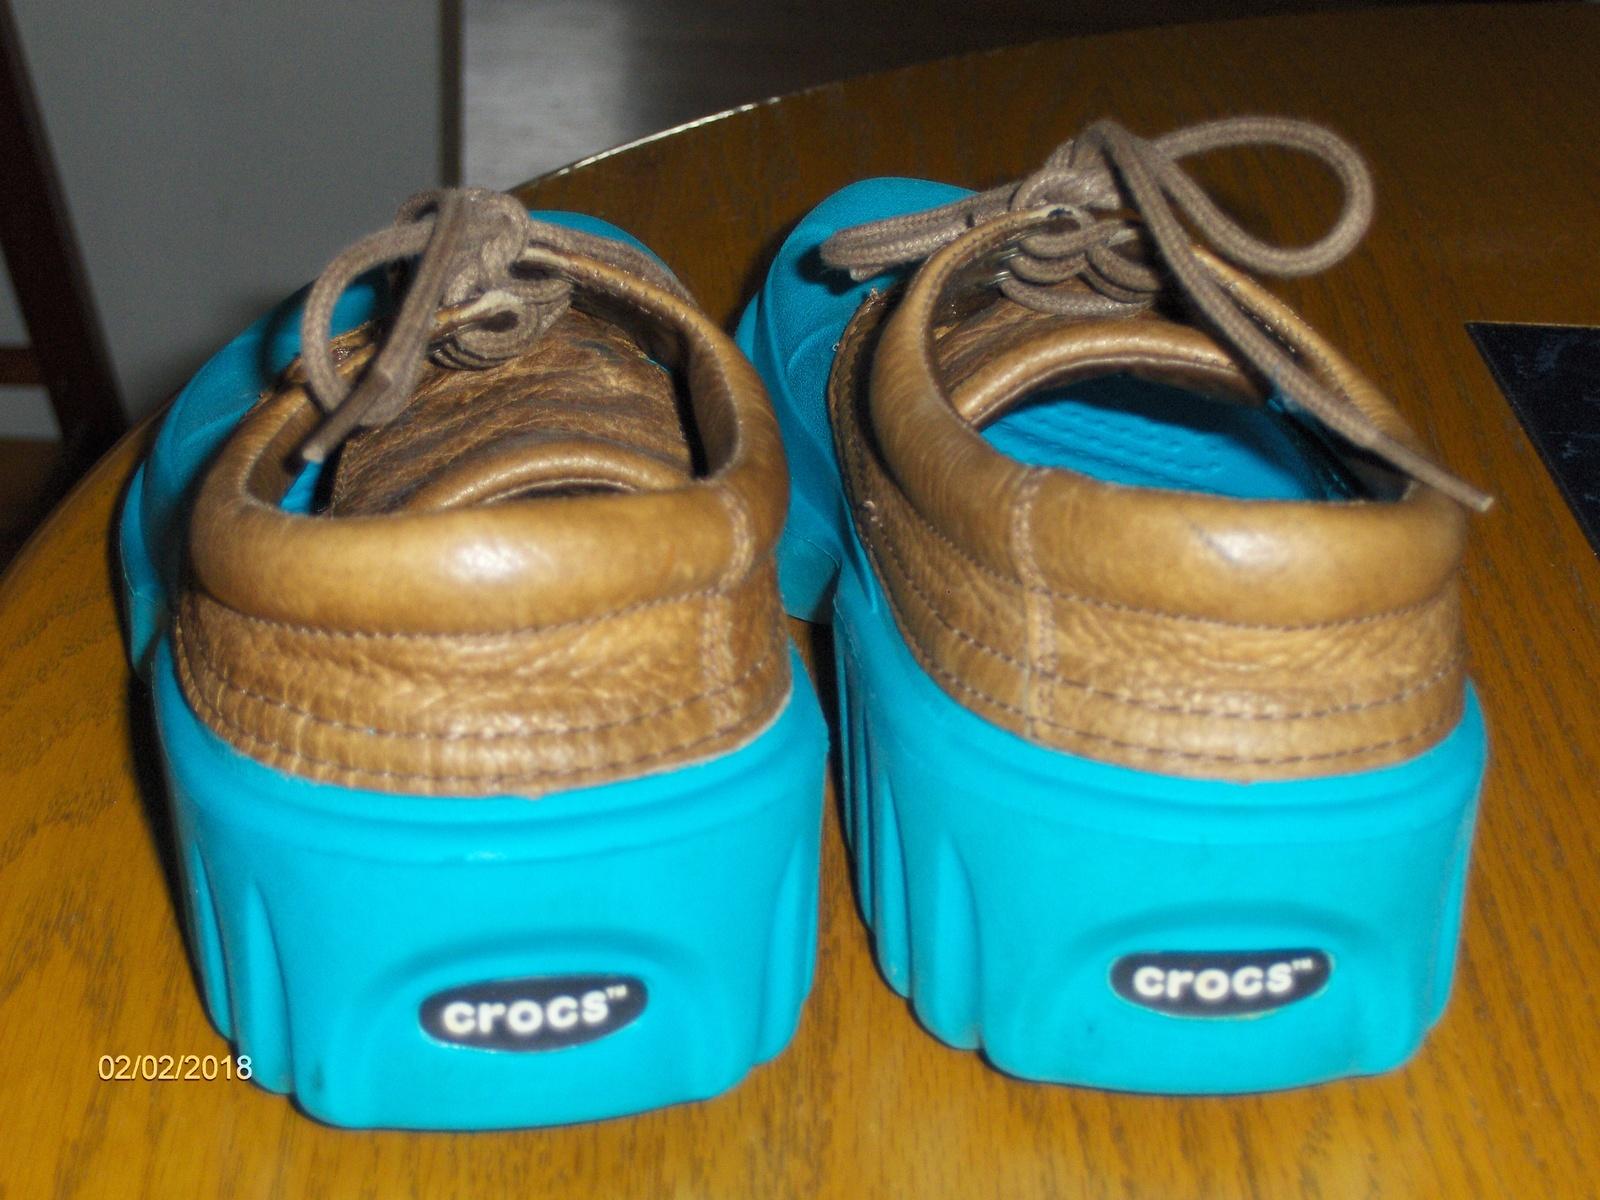 a51b6689d782 Crocs Axle All Terrain Blue Islander Boat Shoes Brown Leather Upper Womens  W8 M6